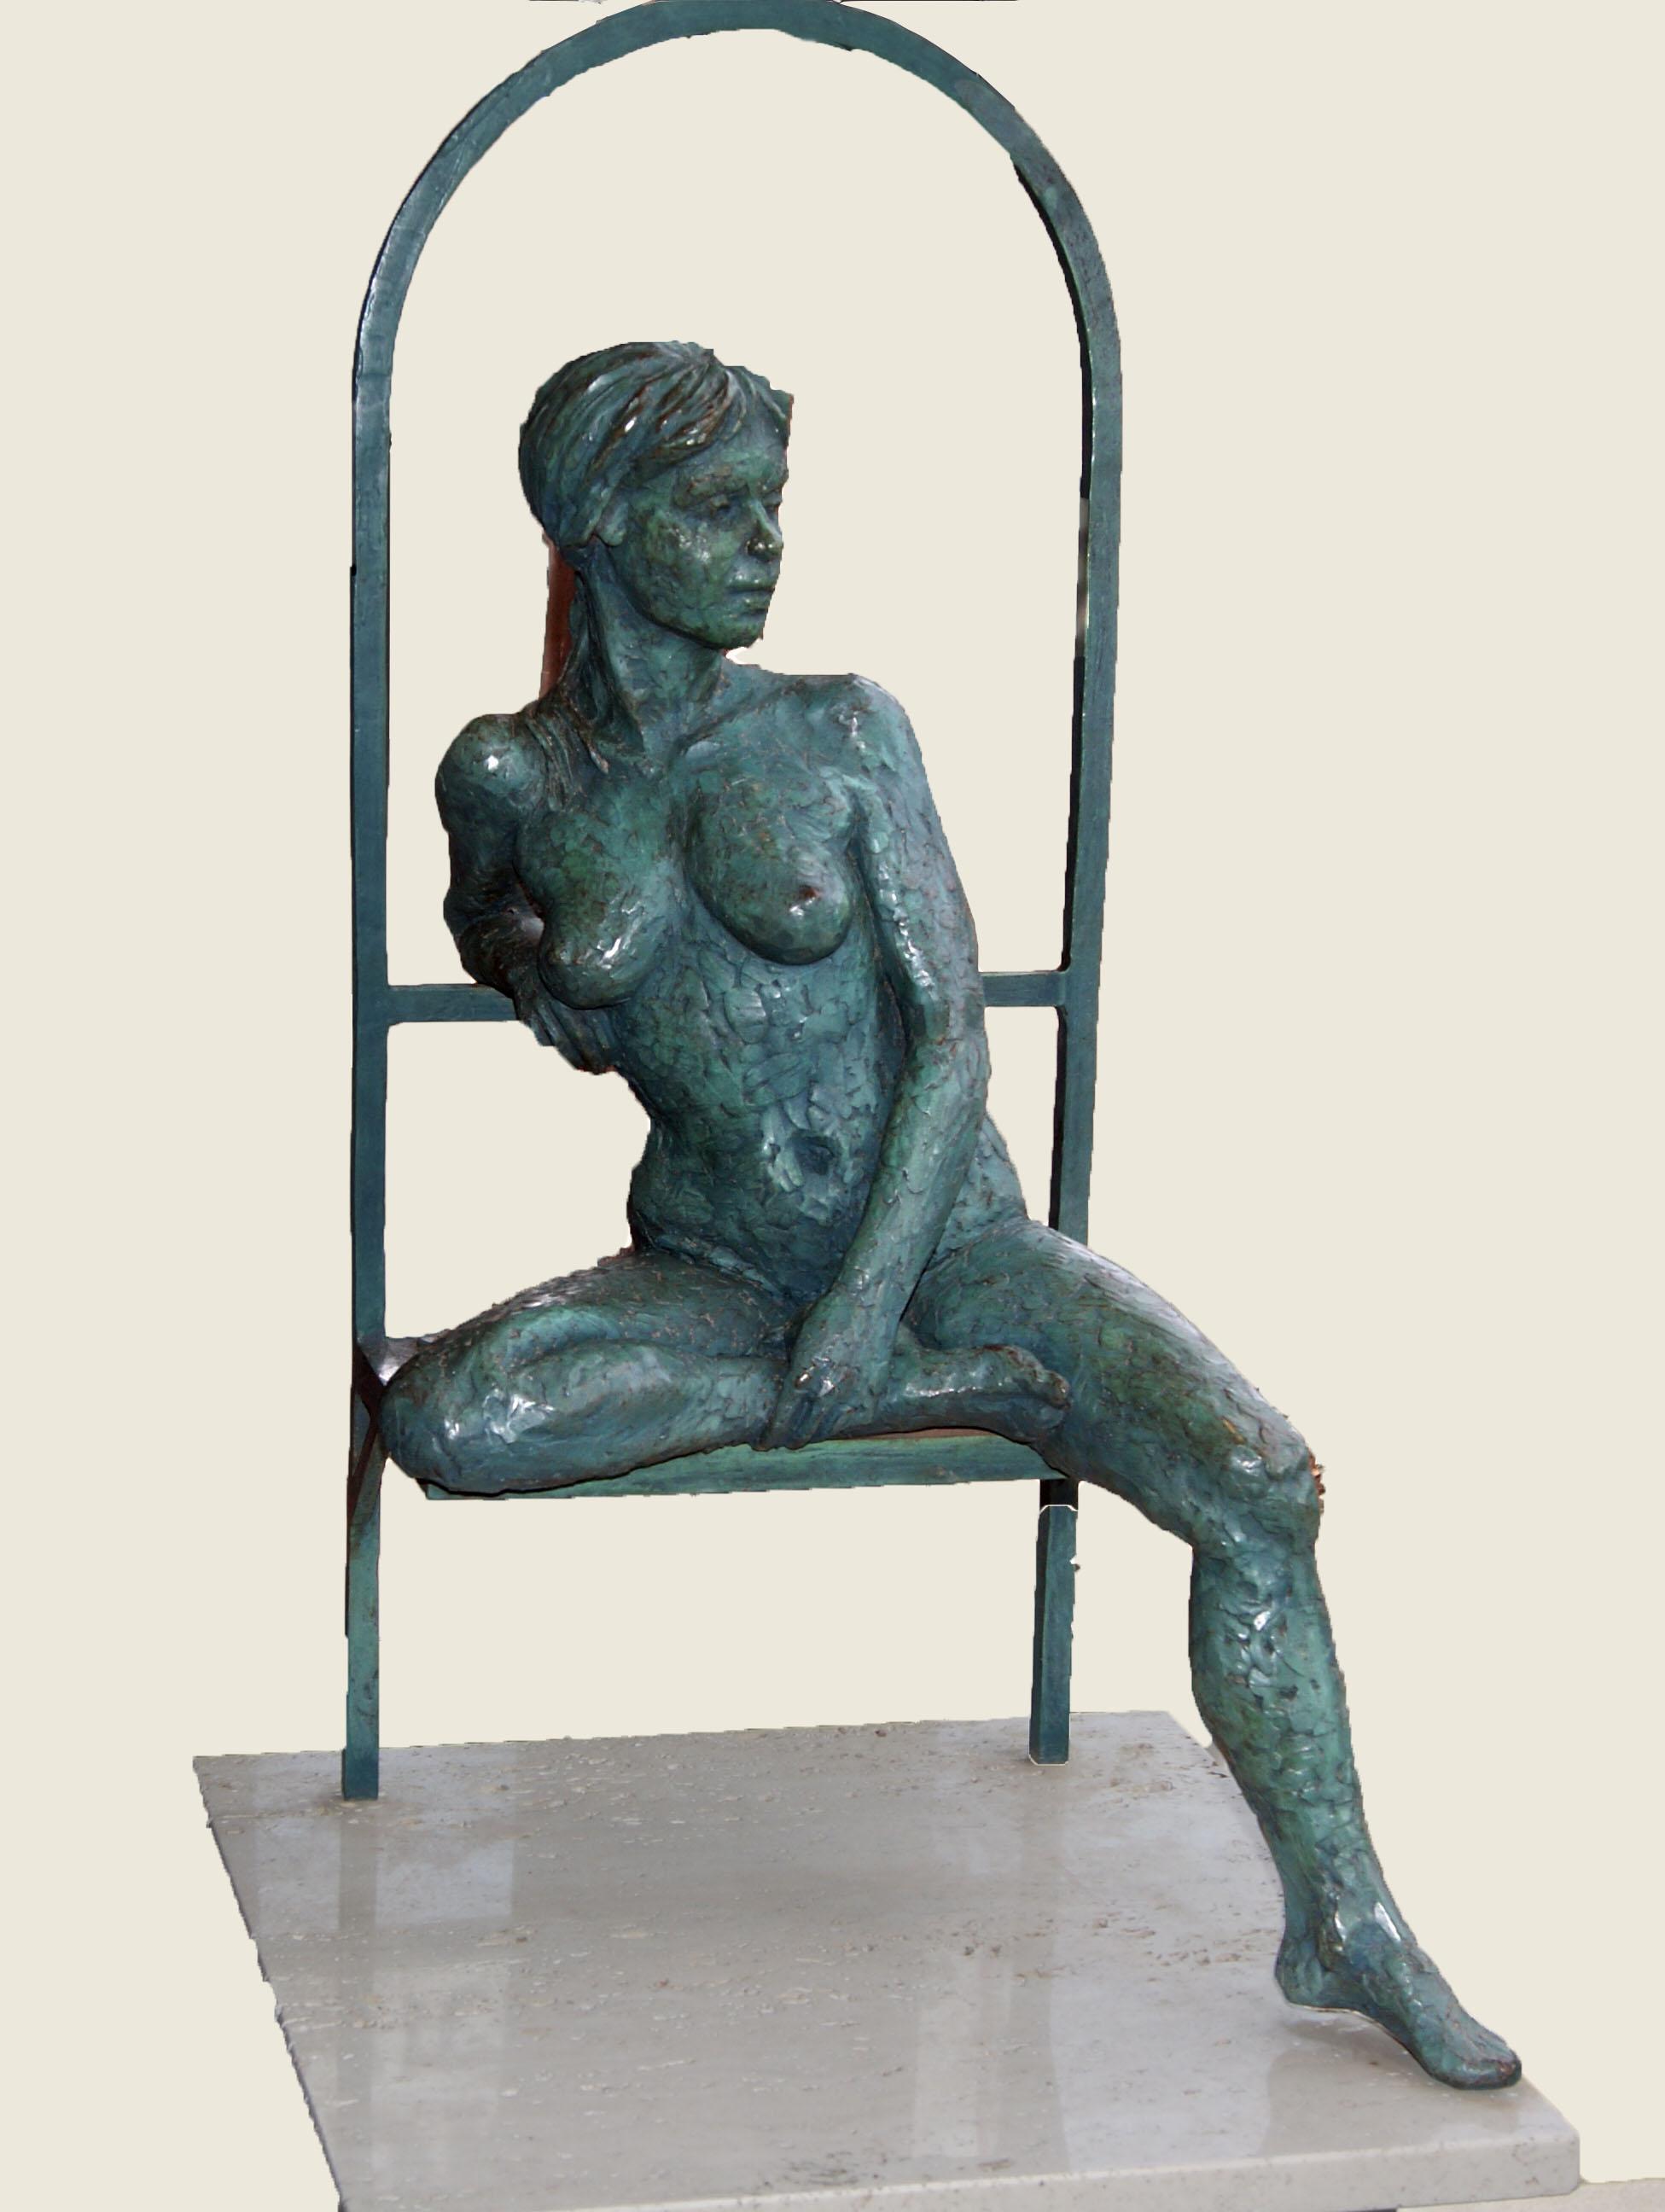 patina bronze, 24h x 14w x 14d